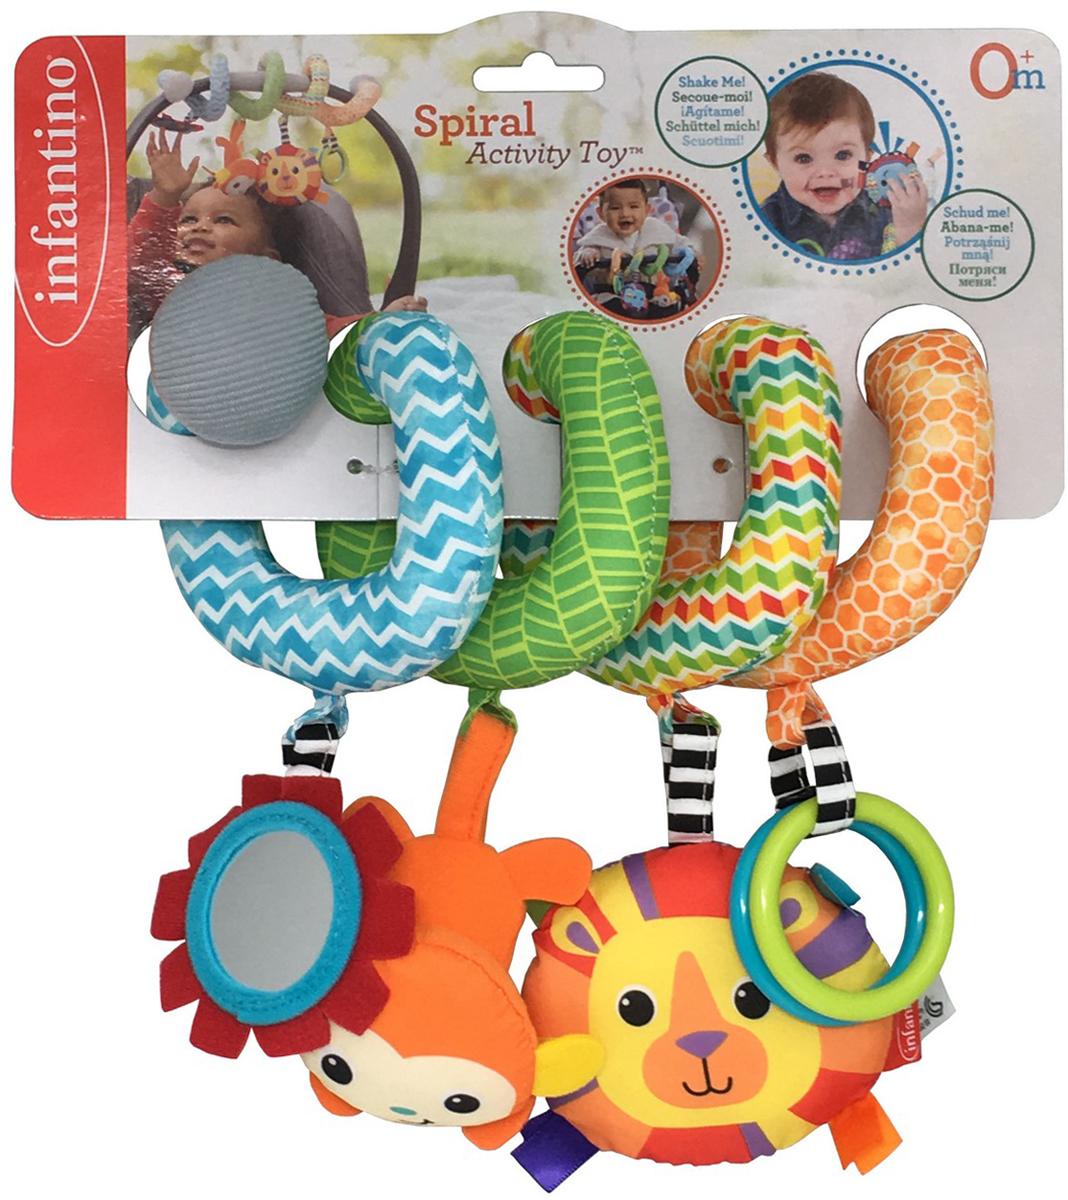 Infantino Развивающая игрушка Спиралька развивающая игрушка infantino единорог